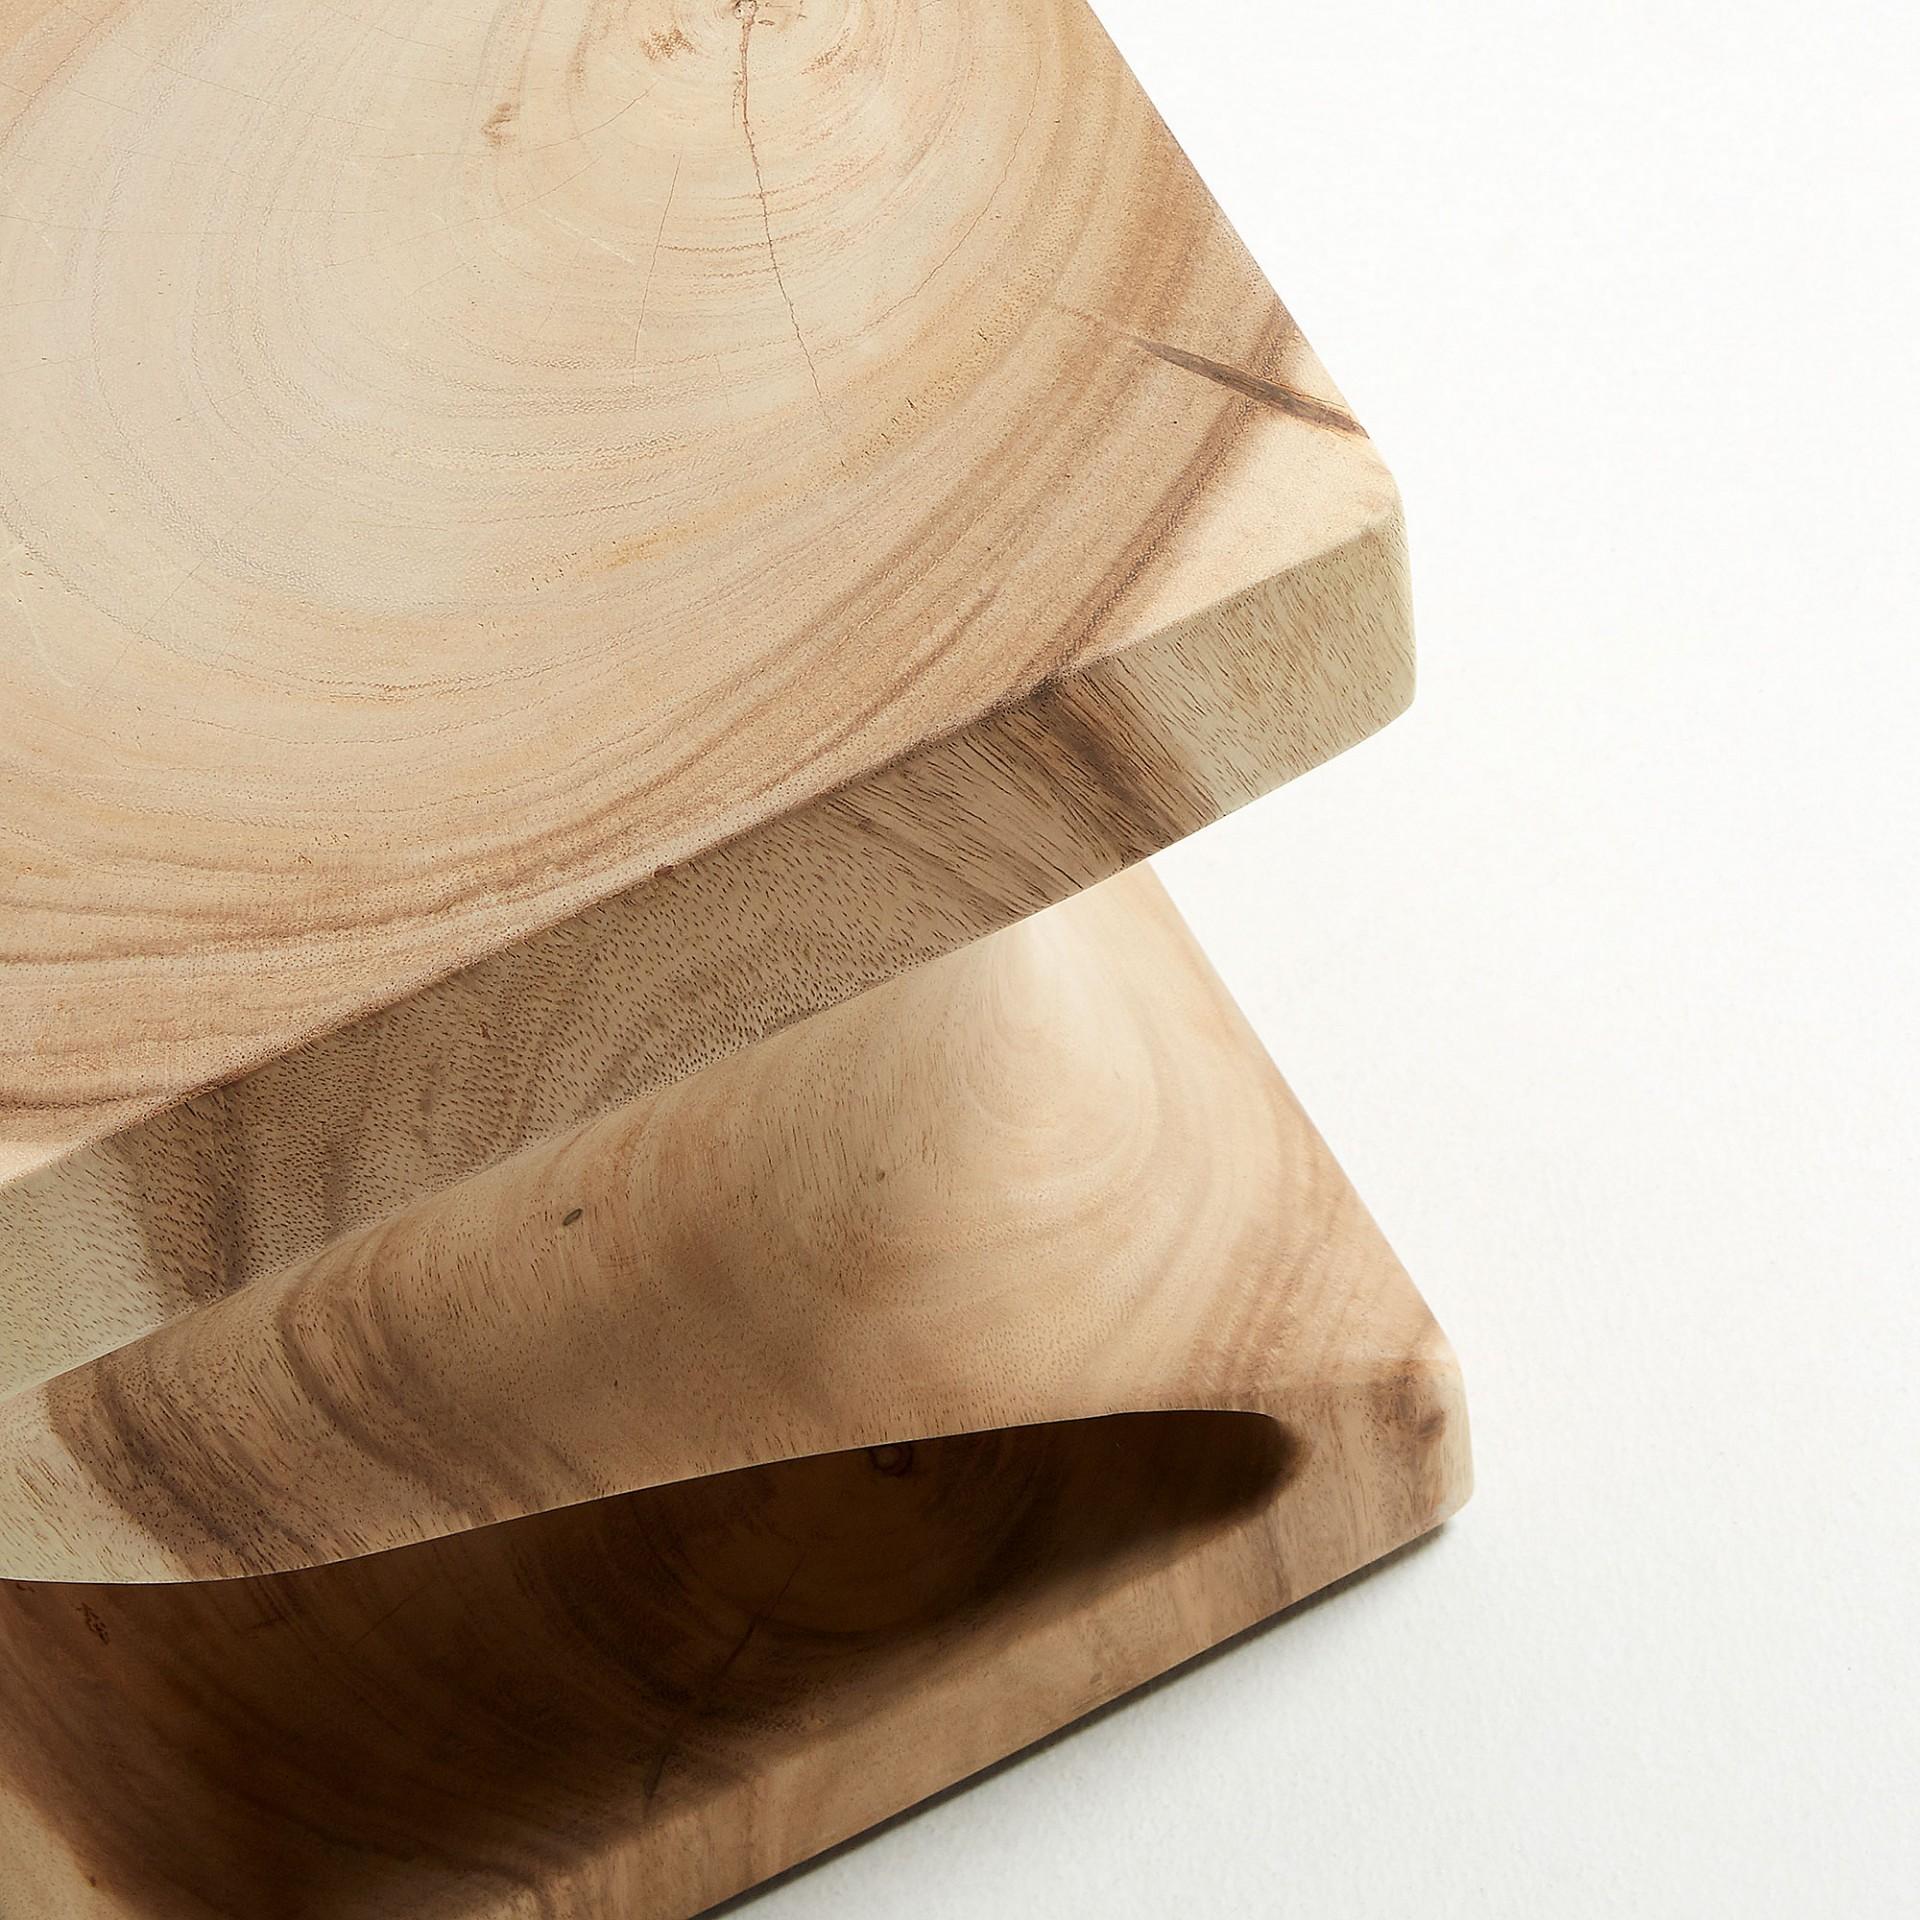 Mesa de apoio Akin, madeira Munggur natural, 30x30x46